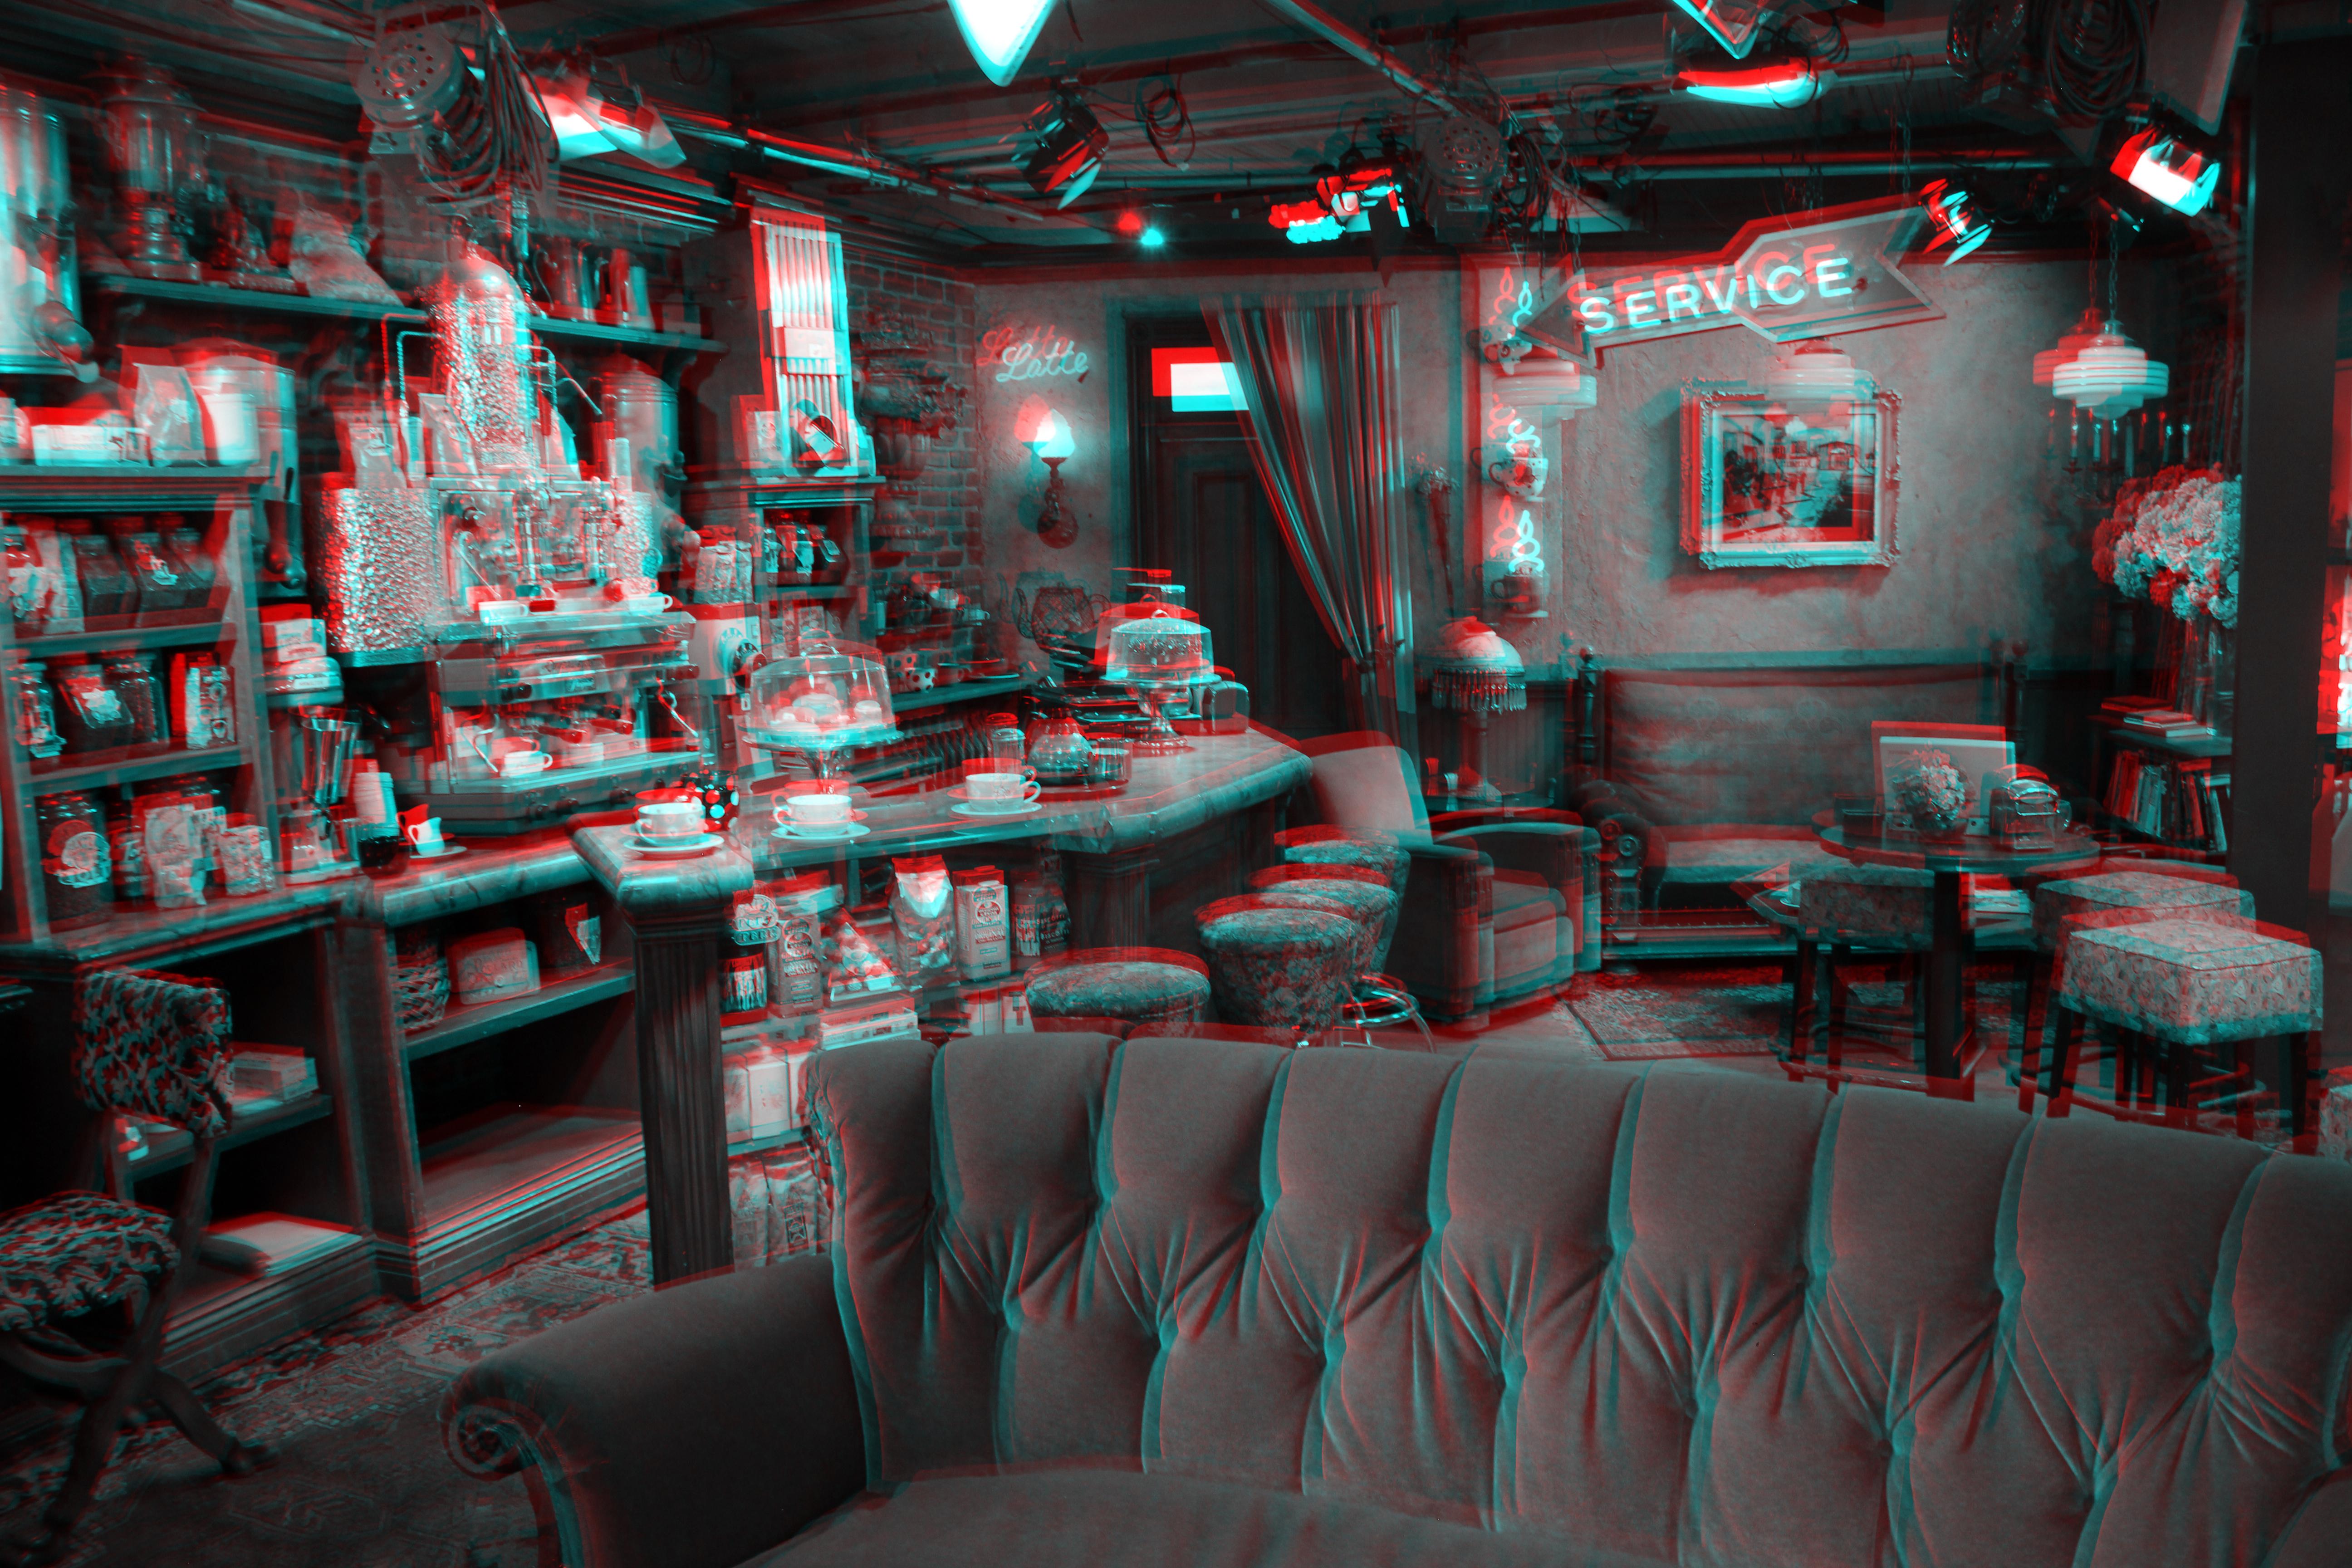 gratis afbeeldingen rood interieur ontwerp stereo theater creativecommons cc0 stadium publiek domein vrienden nocopyright carloszgz